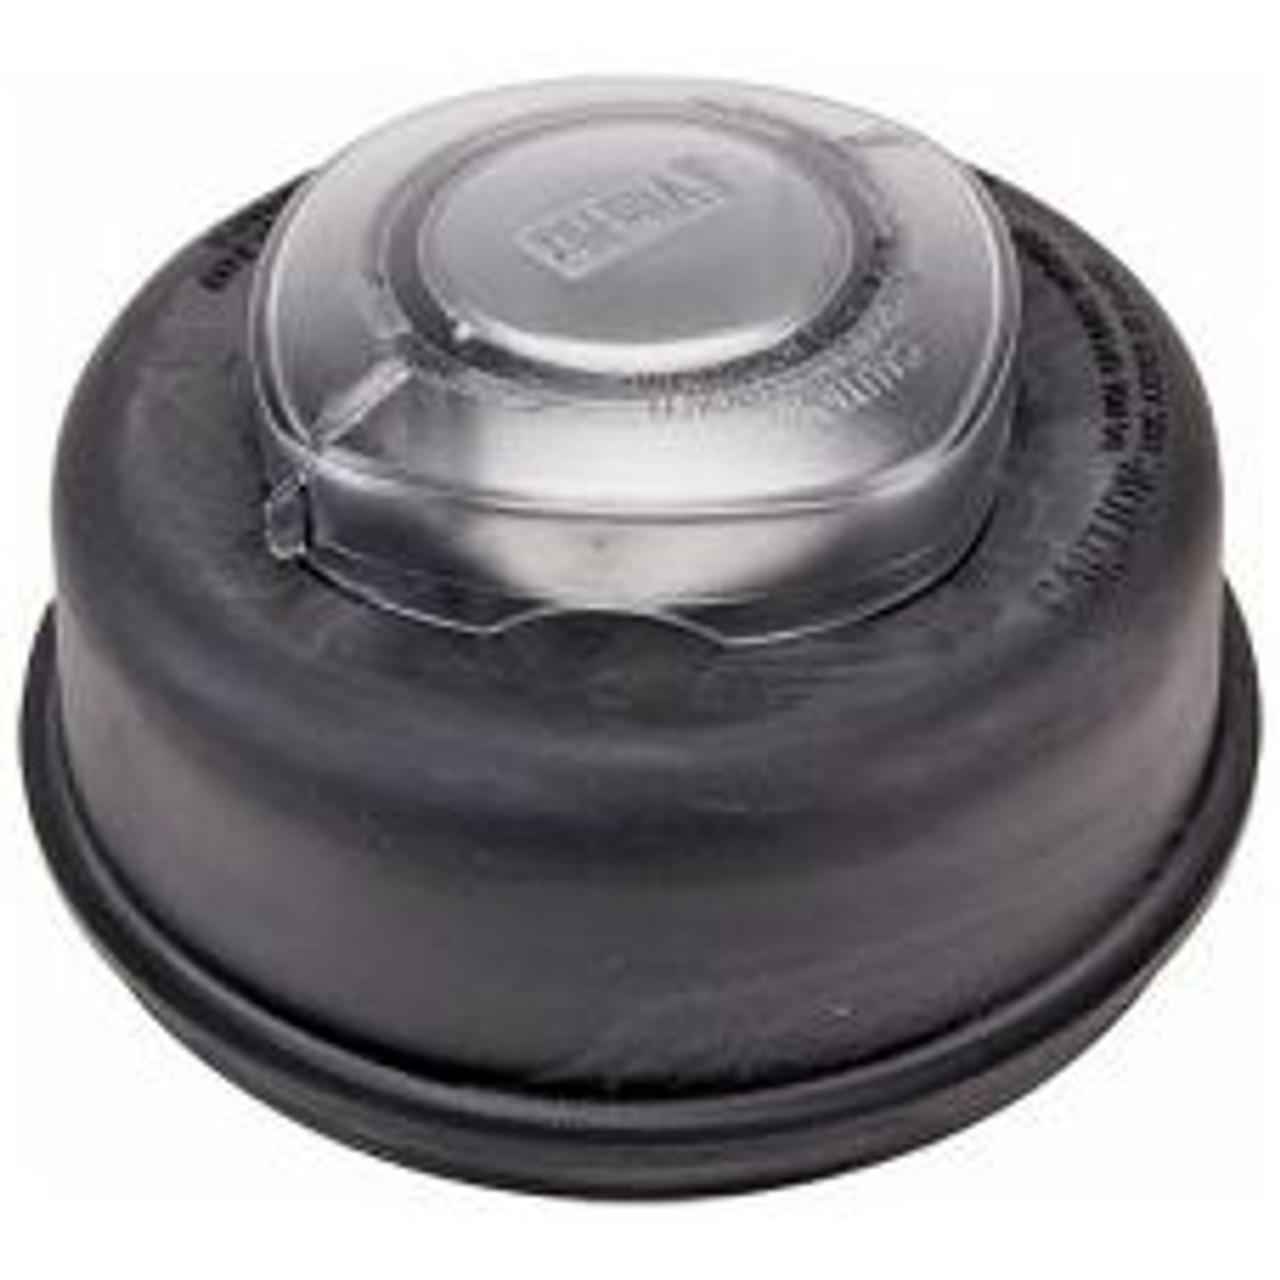 Vitamix Rubber Lid w/ Plug